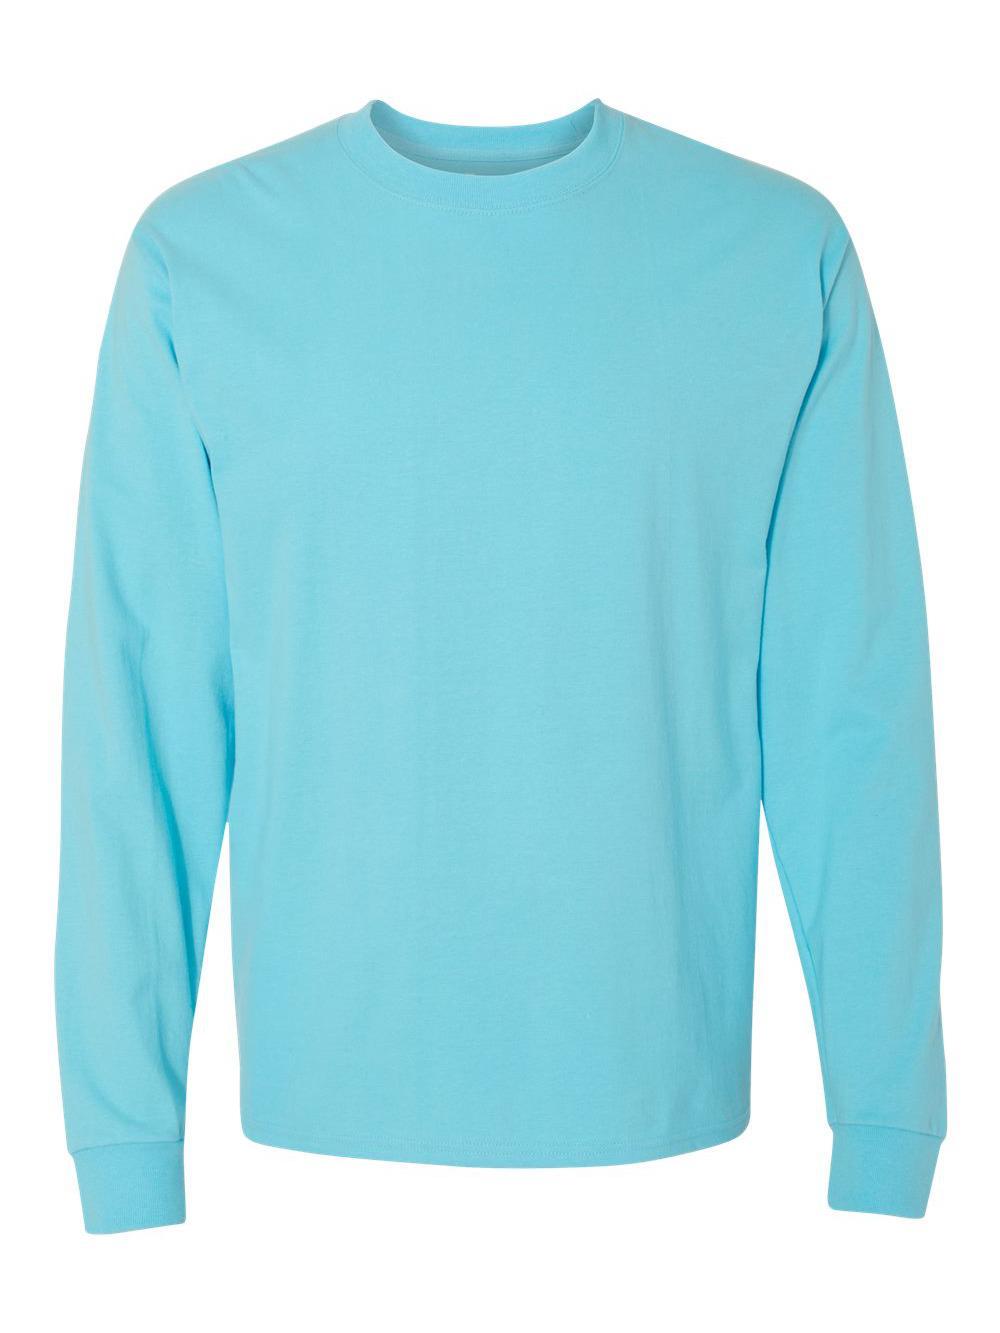 Hanes-Beefy-T-Long-Sleeve-T-Shirt-5186 thumbnail 9